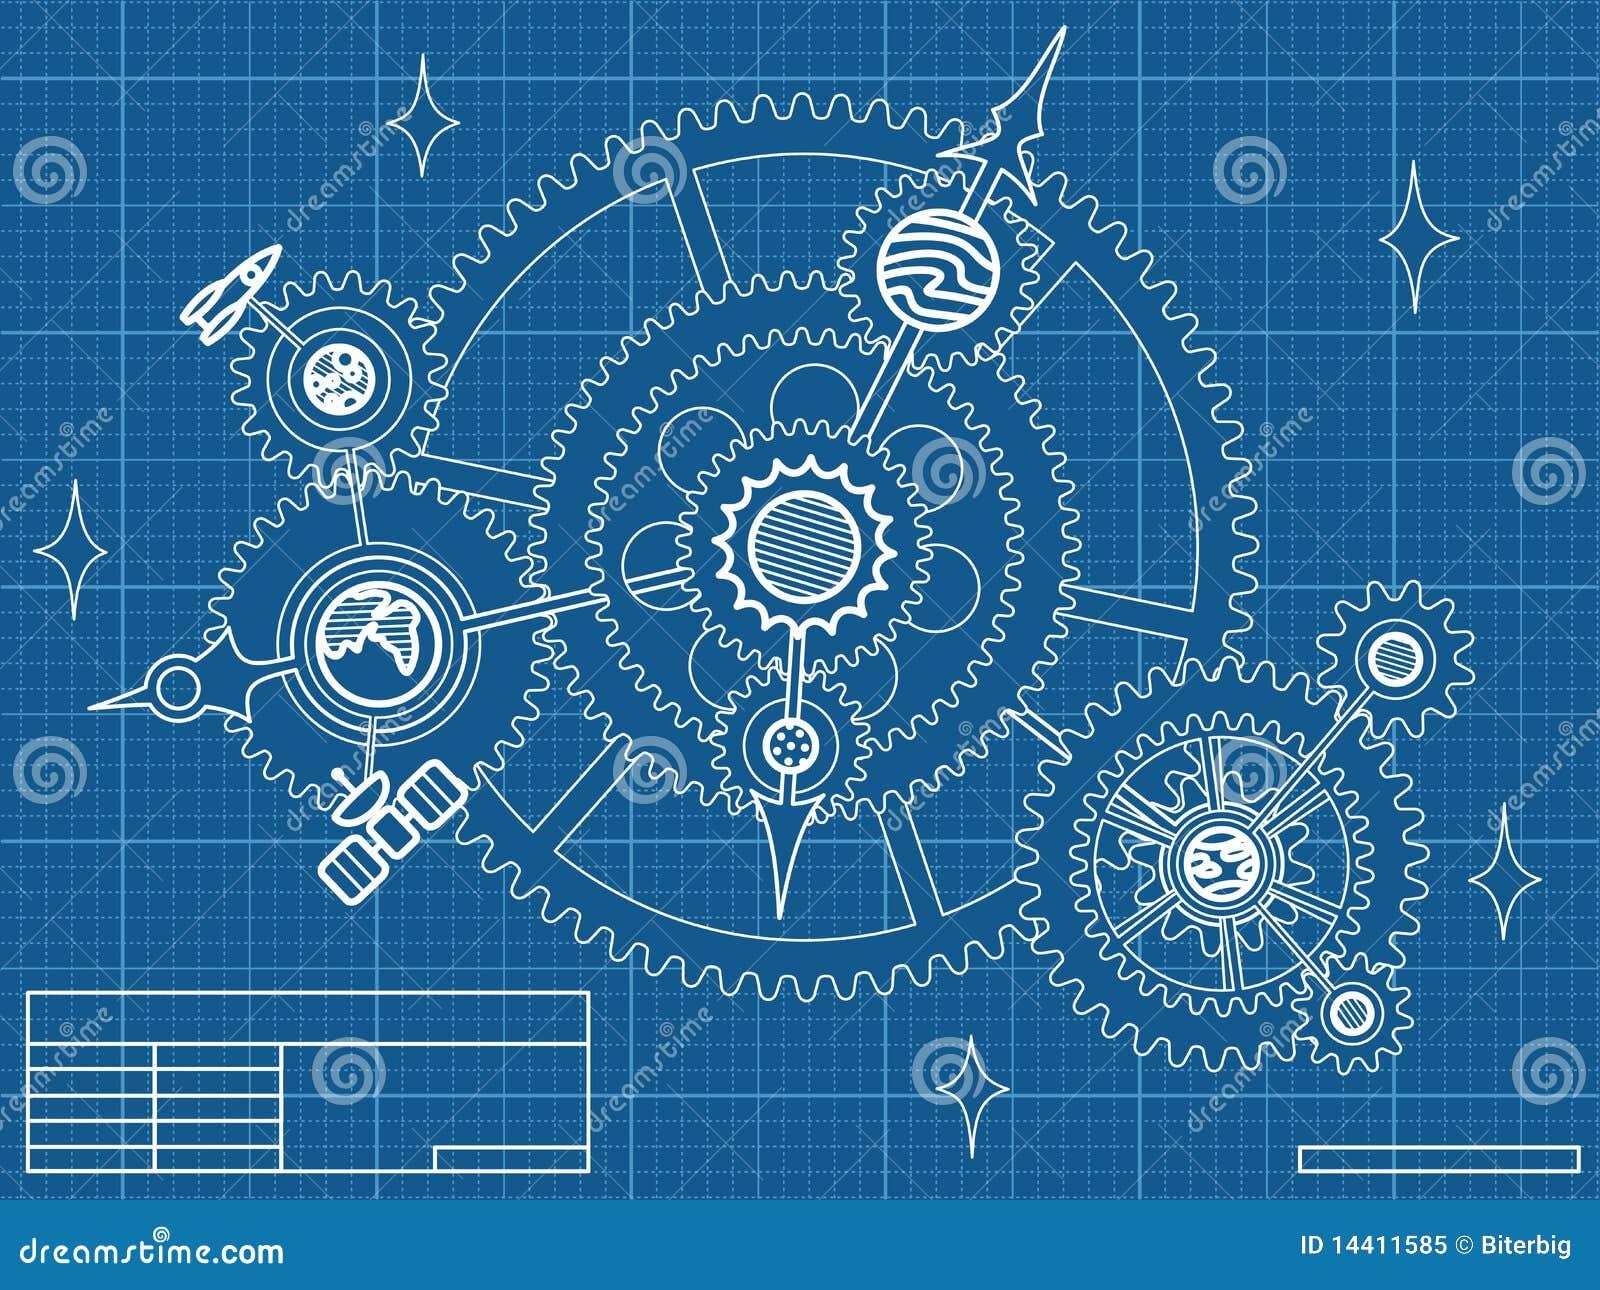 Draw House Blueprints Blueprint Of Space Mechanic Stock Vector Illustration Of